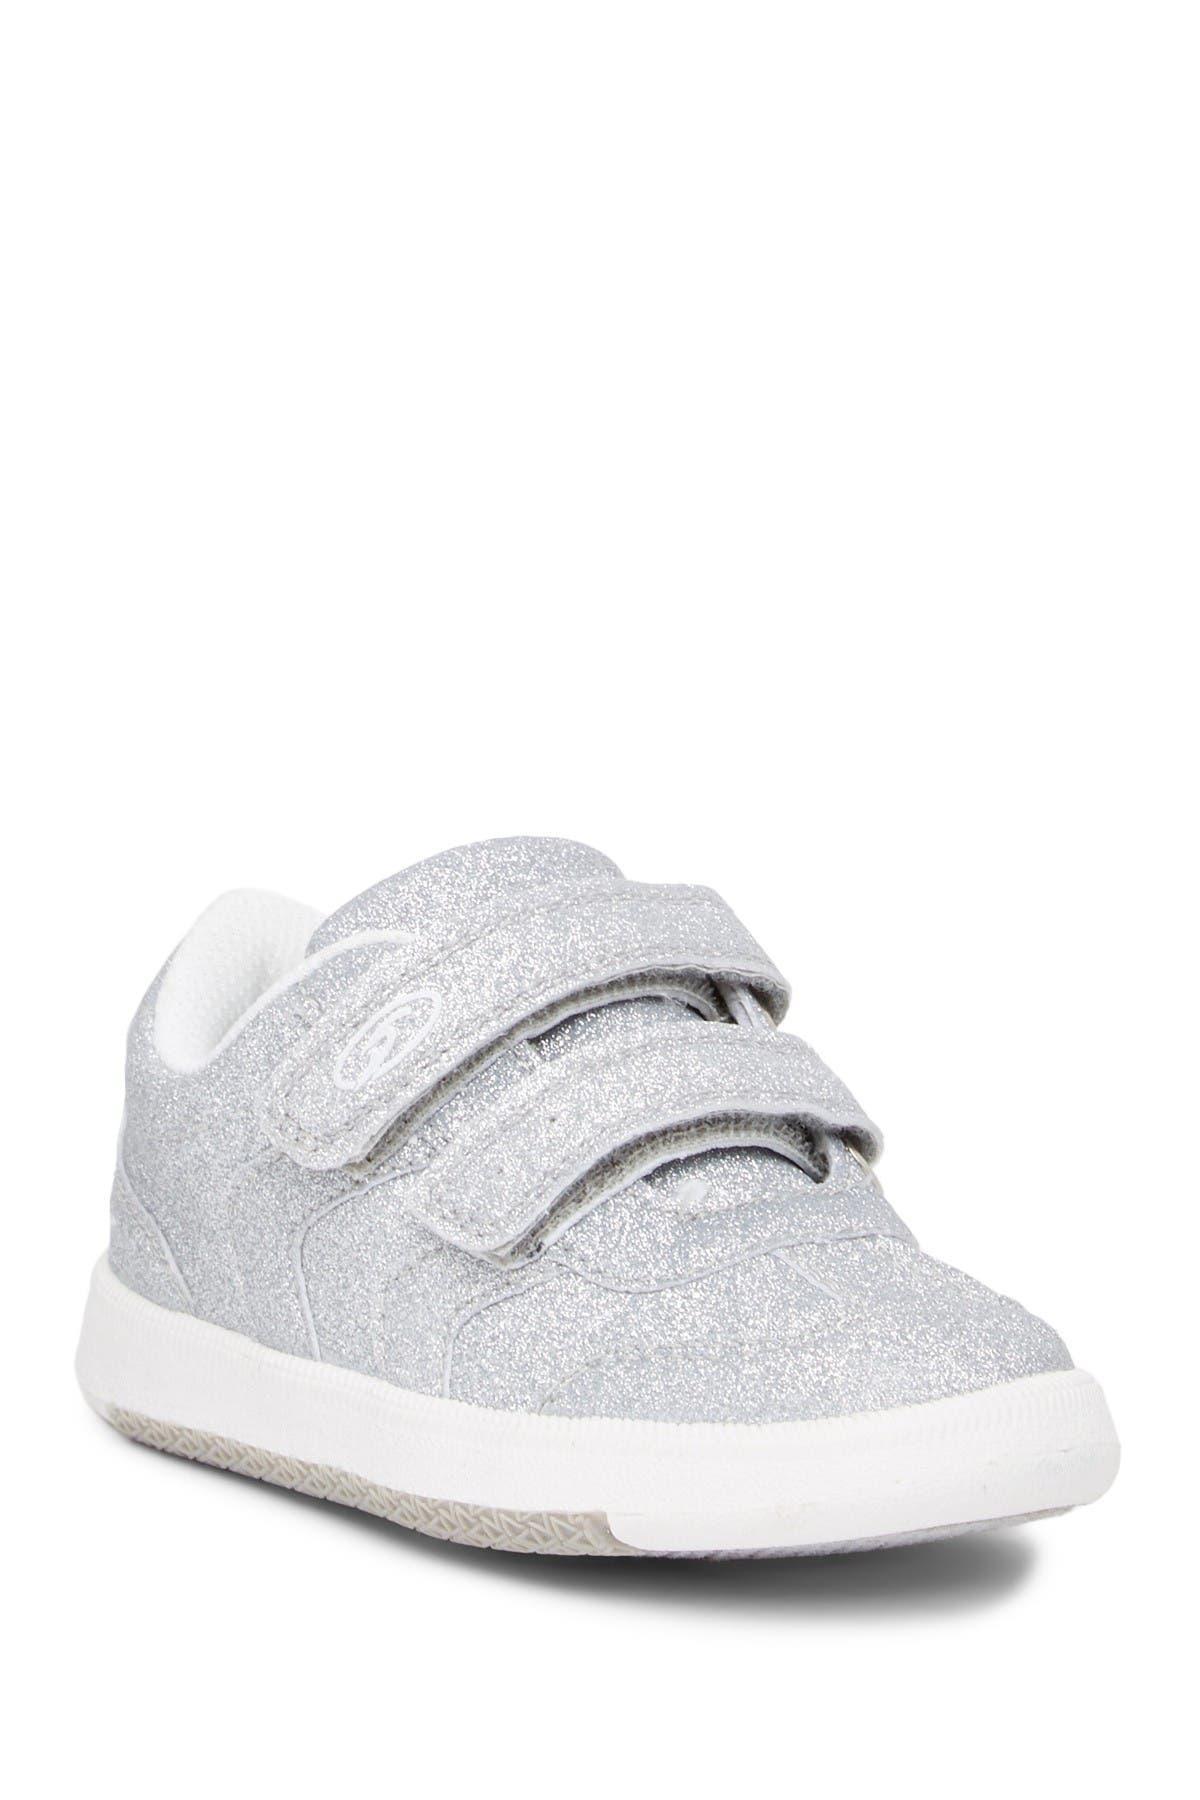 baby glitter sneakers